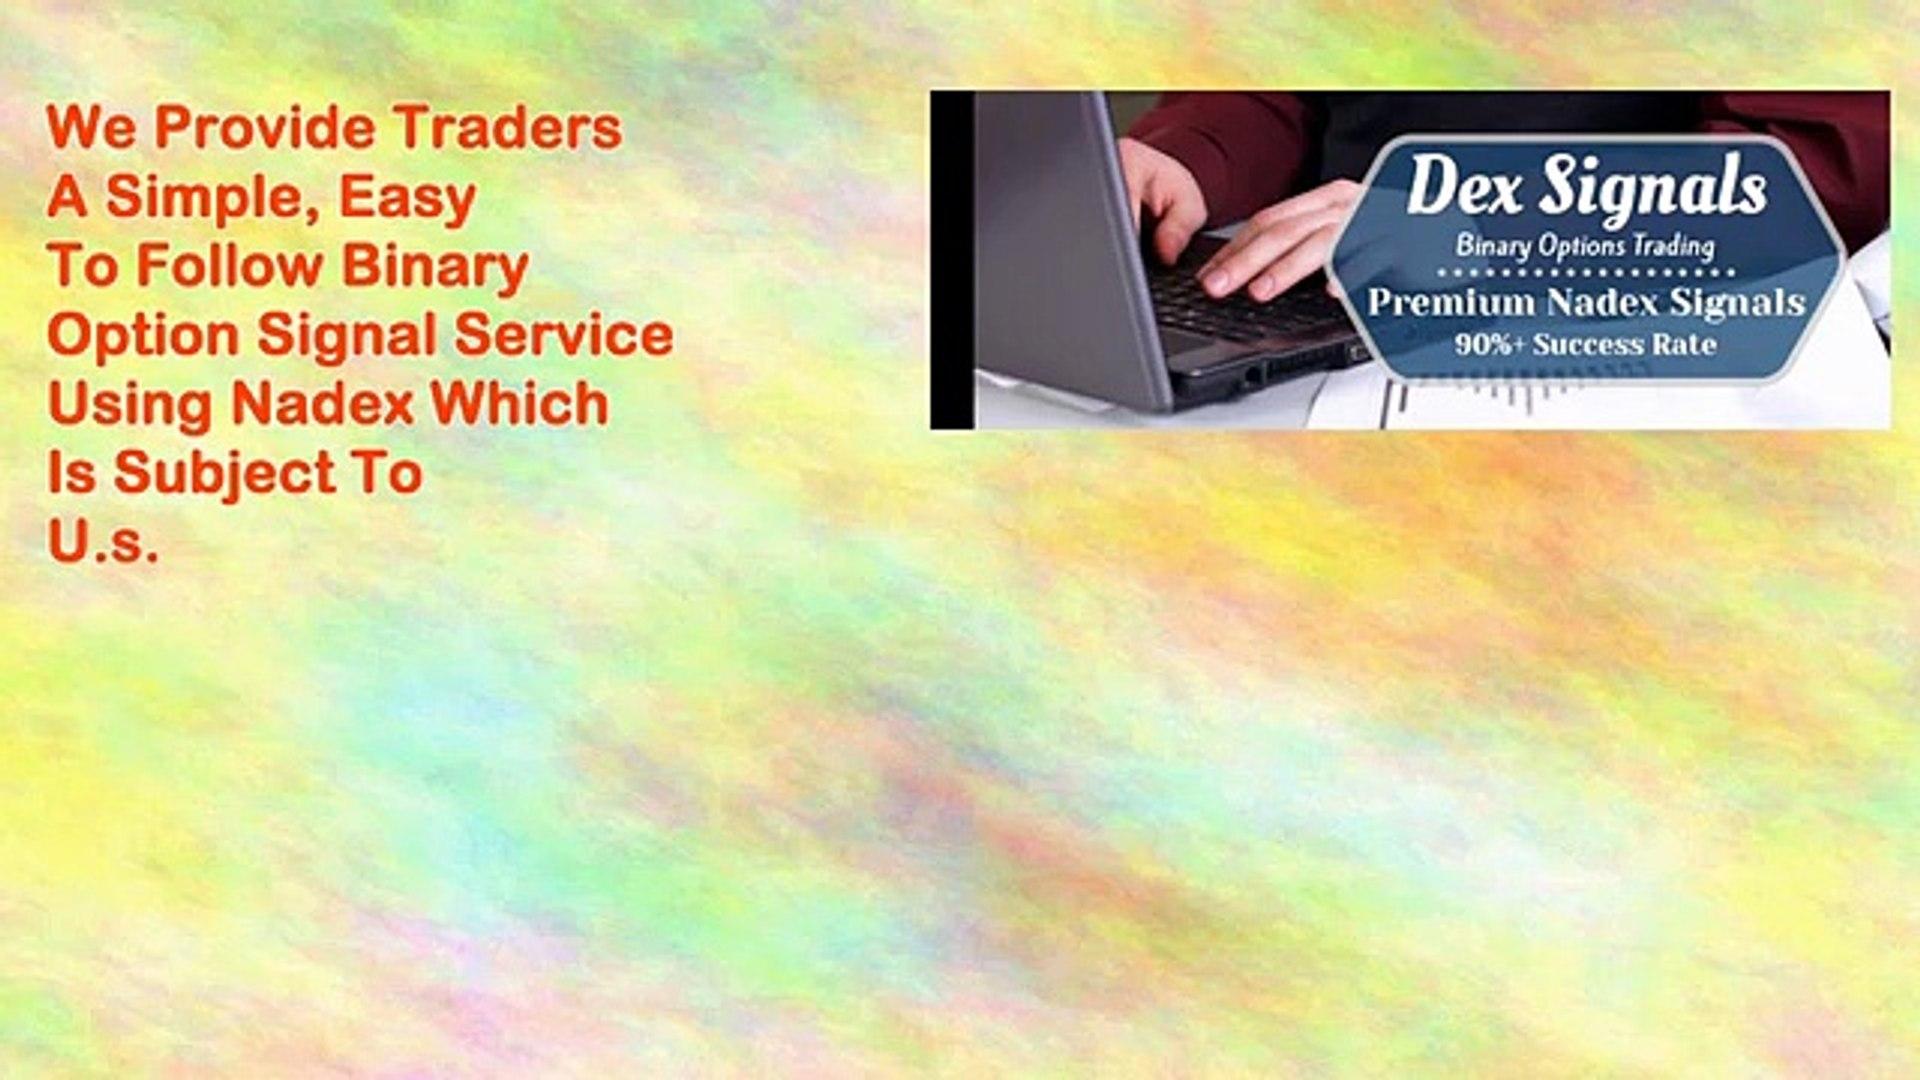 Nadex binary options signals service betting bangarraju dvdripfilms